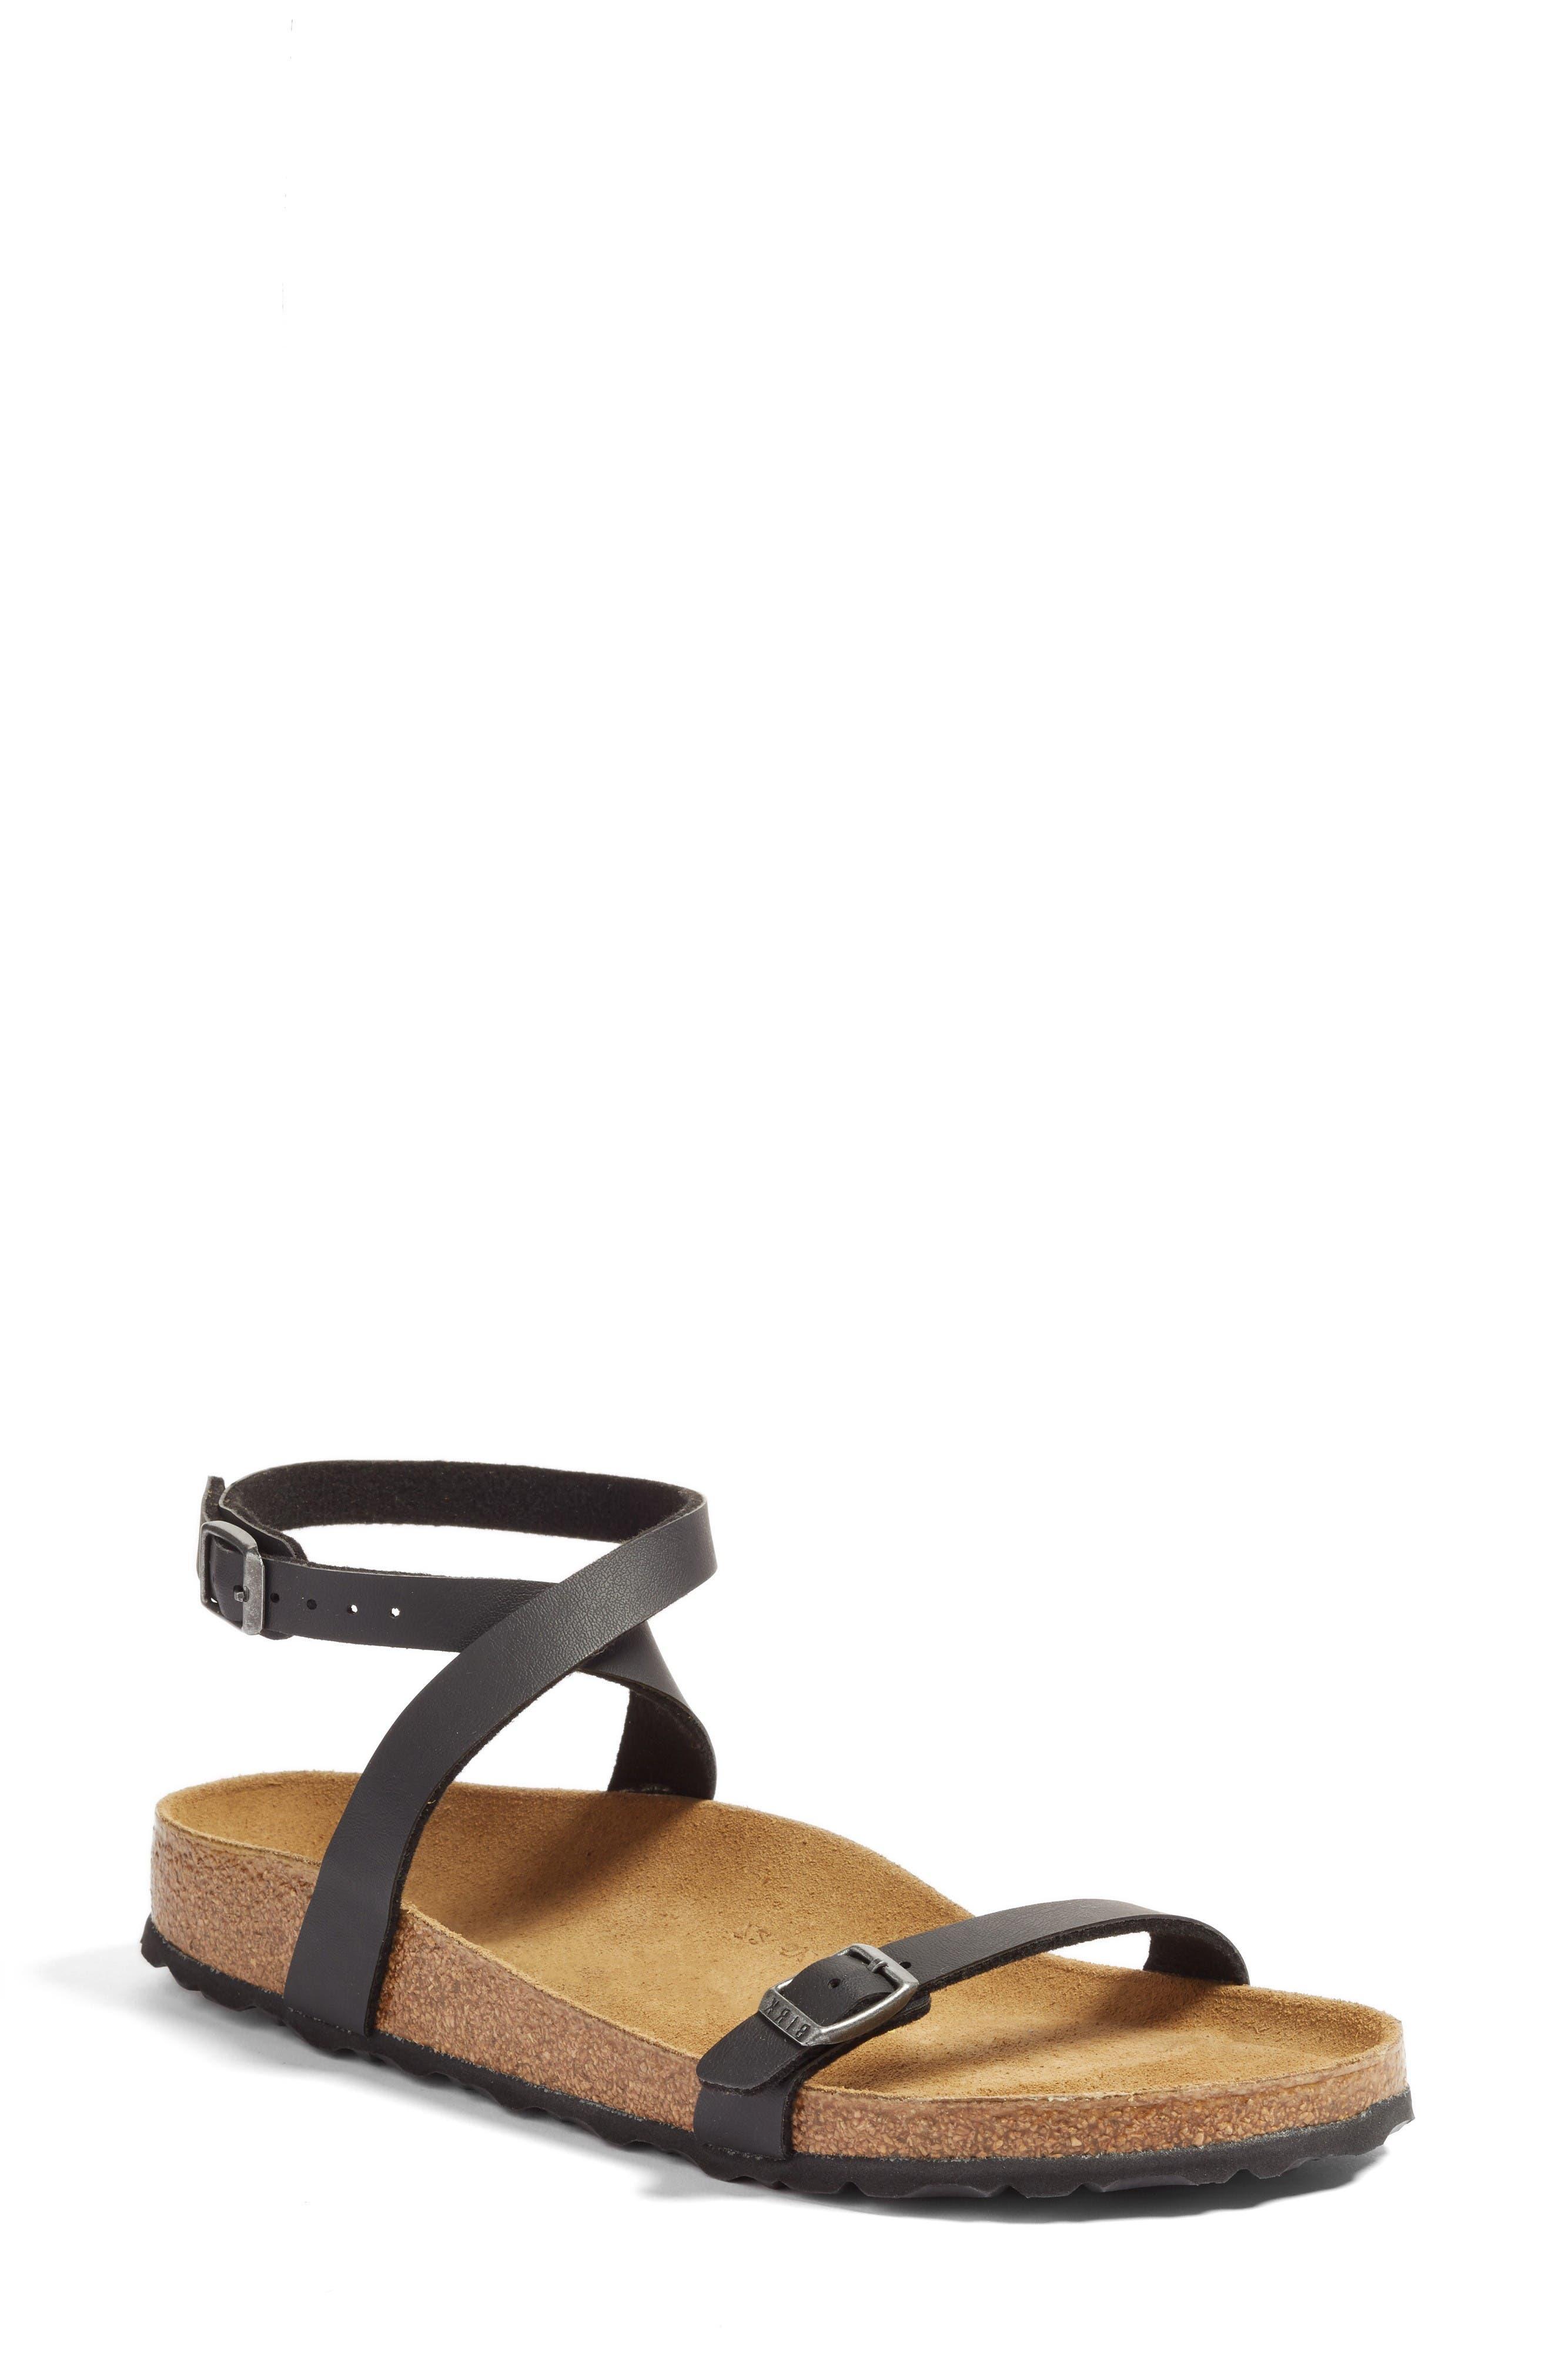 Daloa Ankle Strap Sandal,                             Main thumbnail 1, color,                             Black